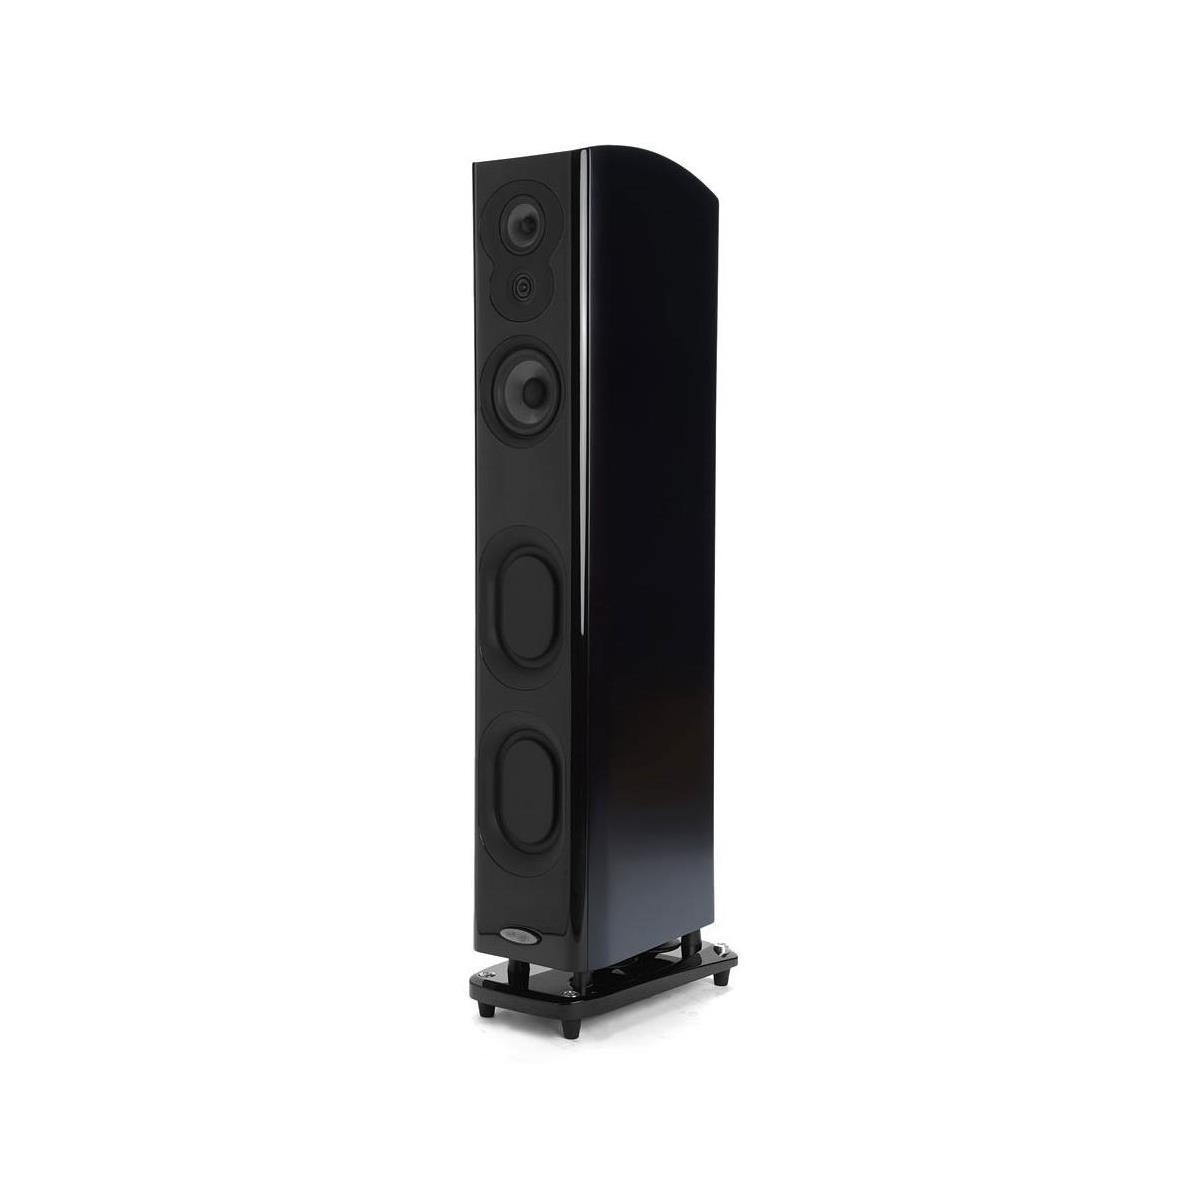 Polk Audio LSiM Series Speakers: 706C Center $600, M705 Floorstanding  $750 Each & More + Free Shipping